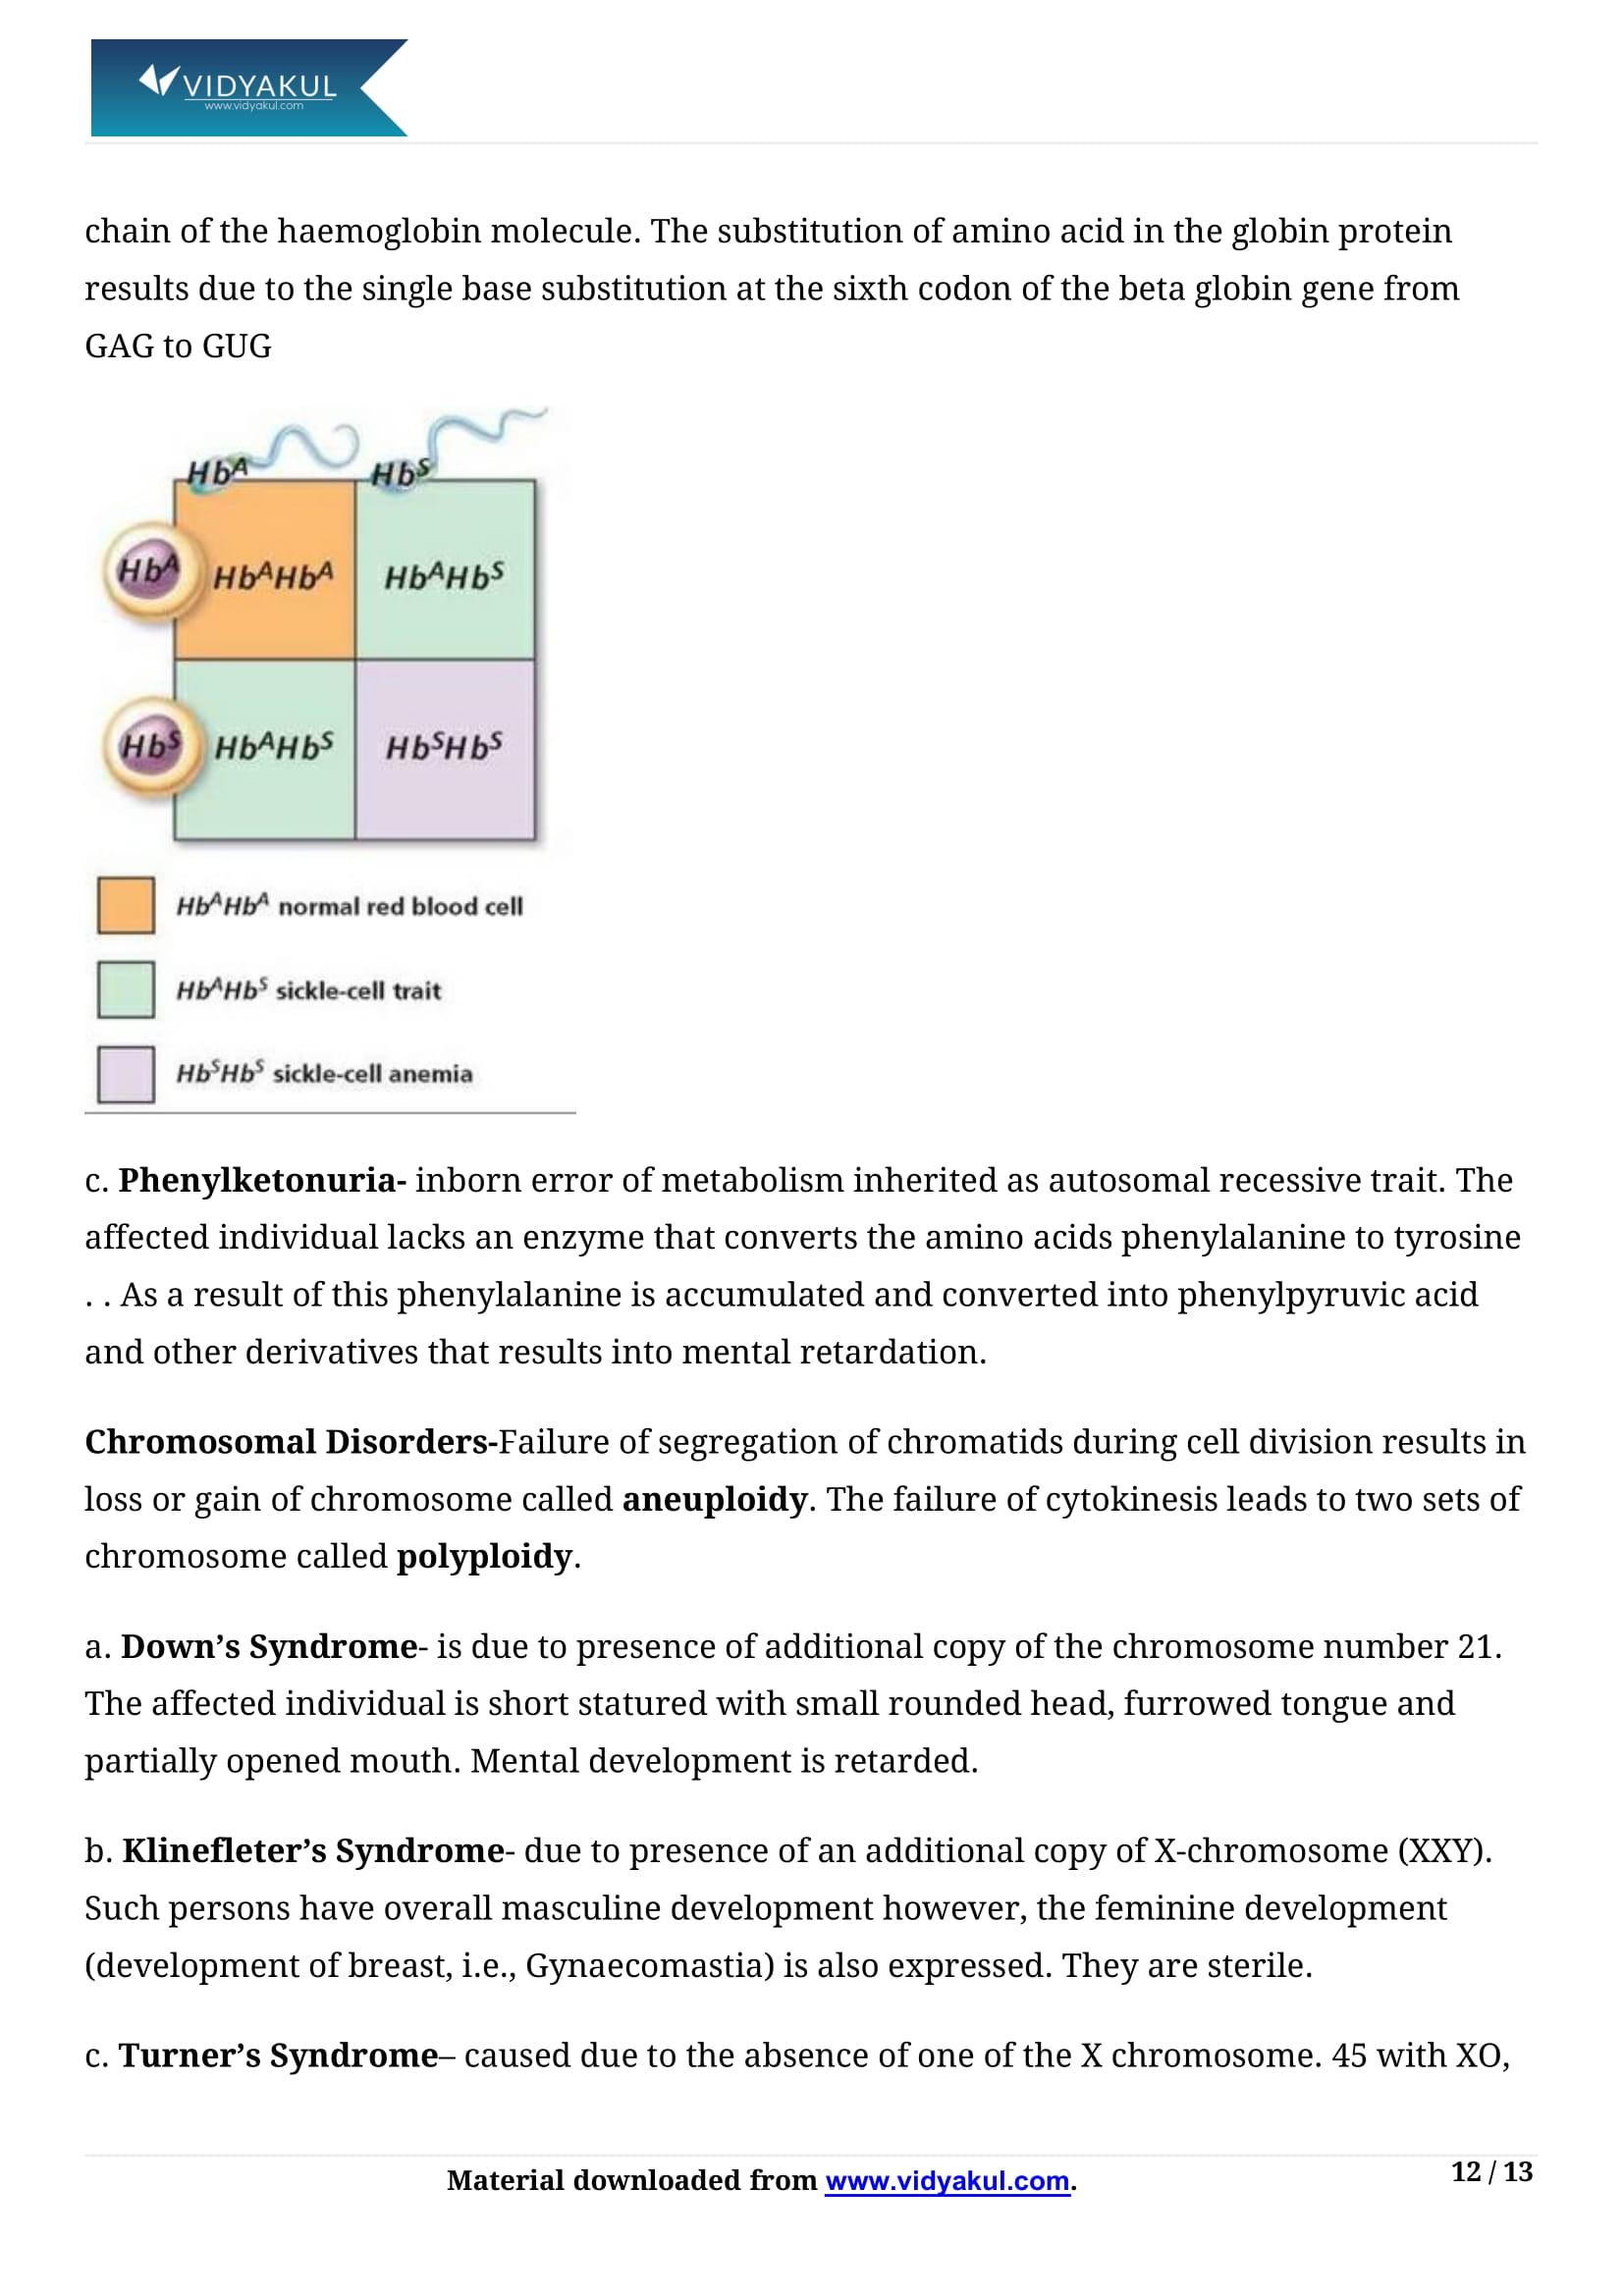 Principles of Inheritance and Variation Class 12 Notes | Vidyakul